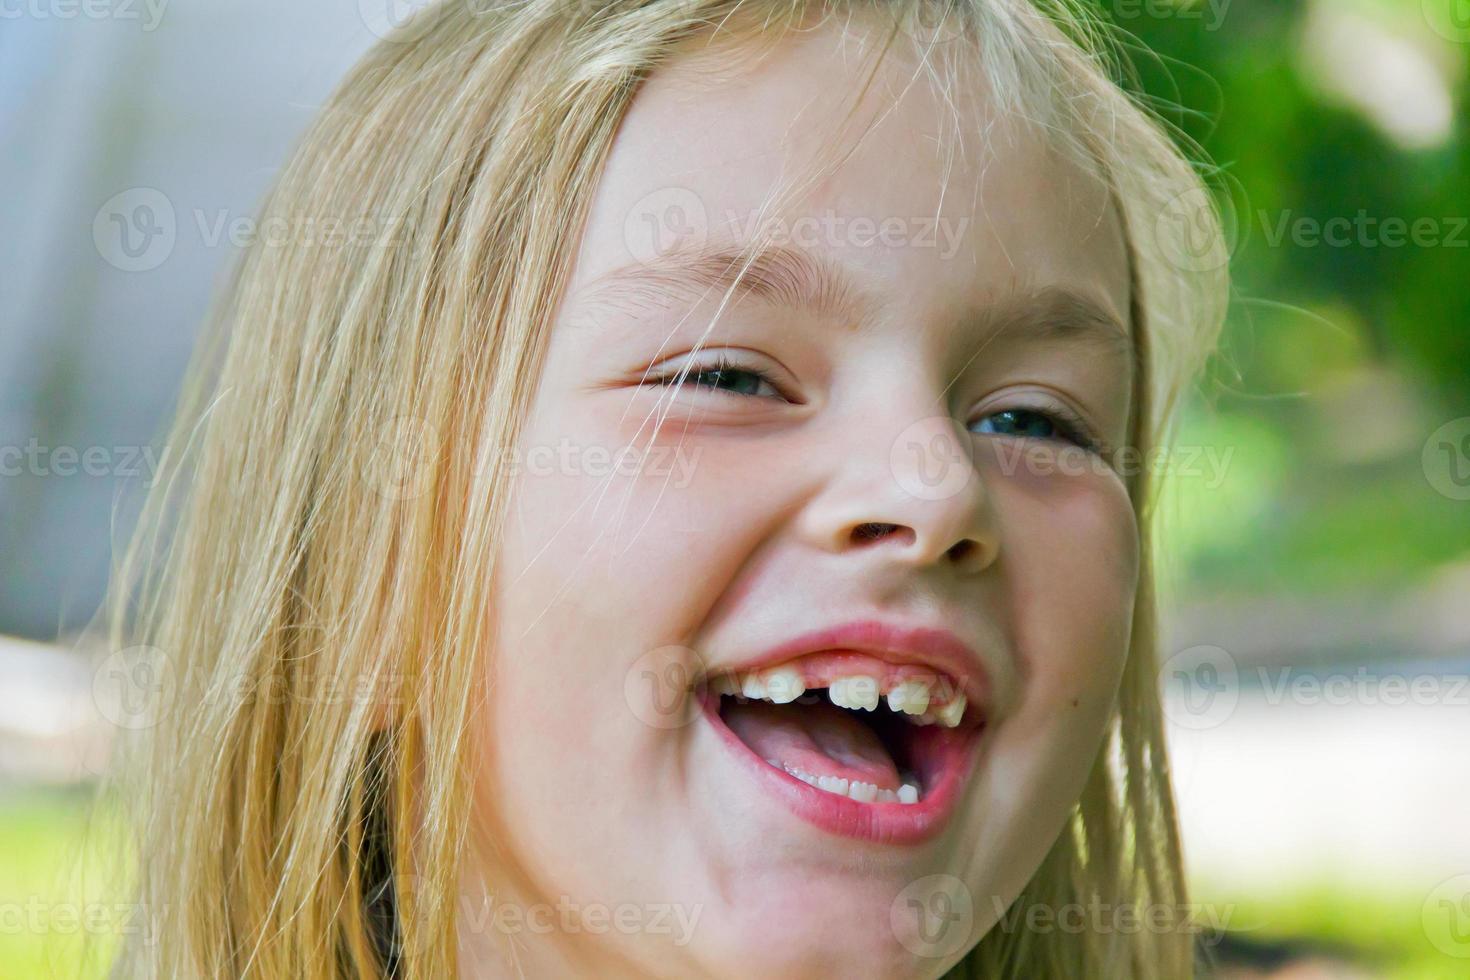 Cute smiling girl photo